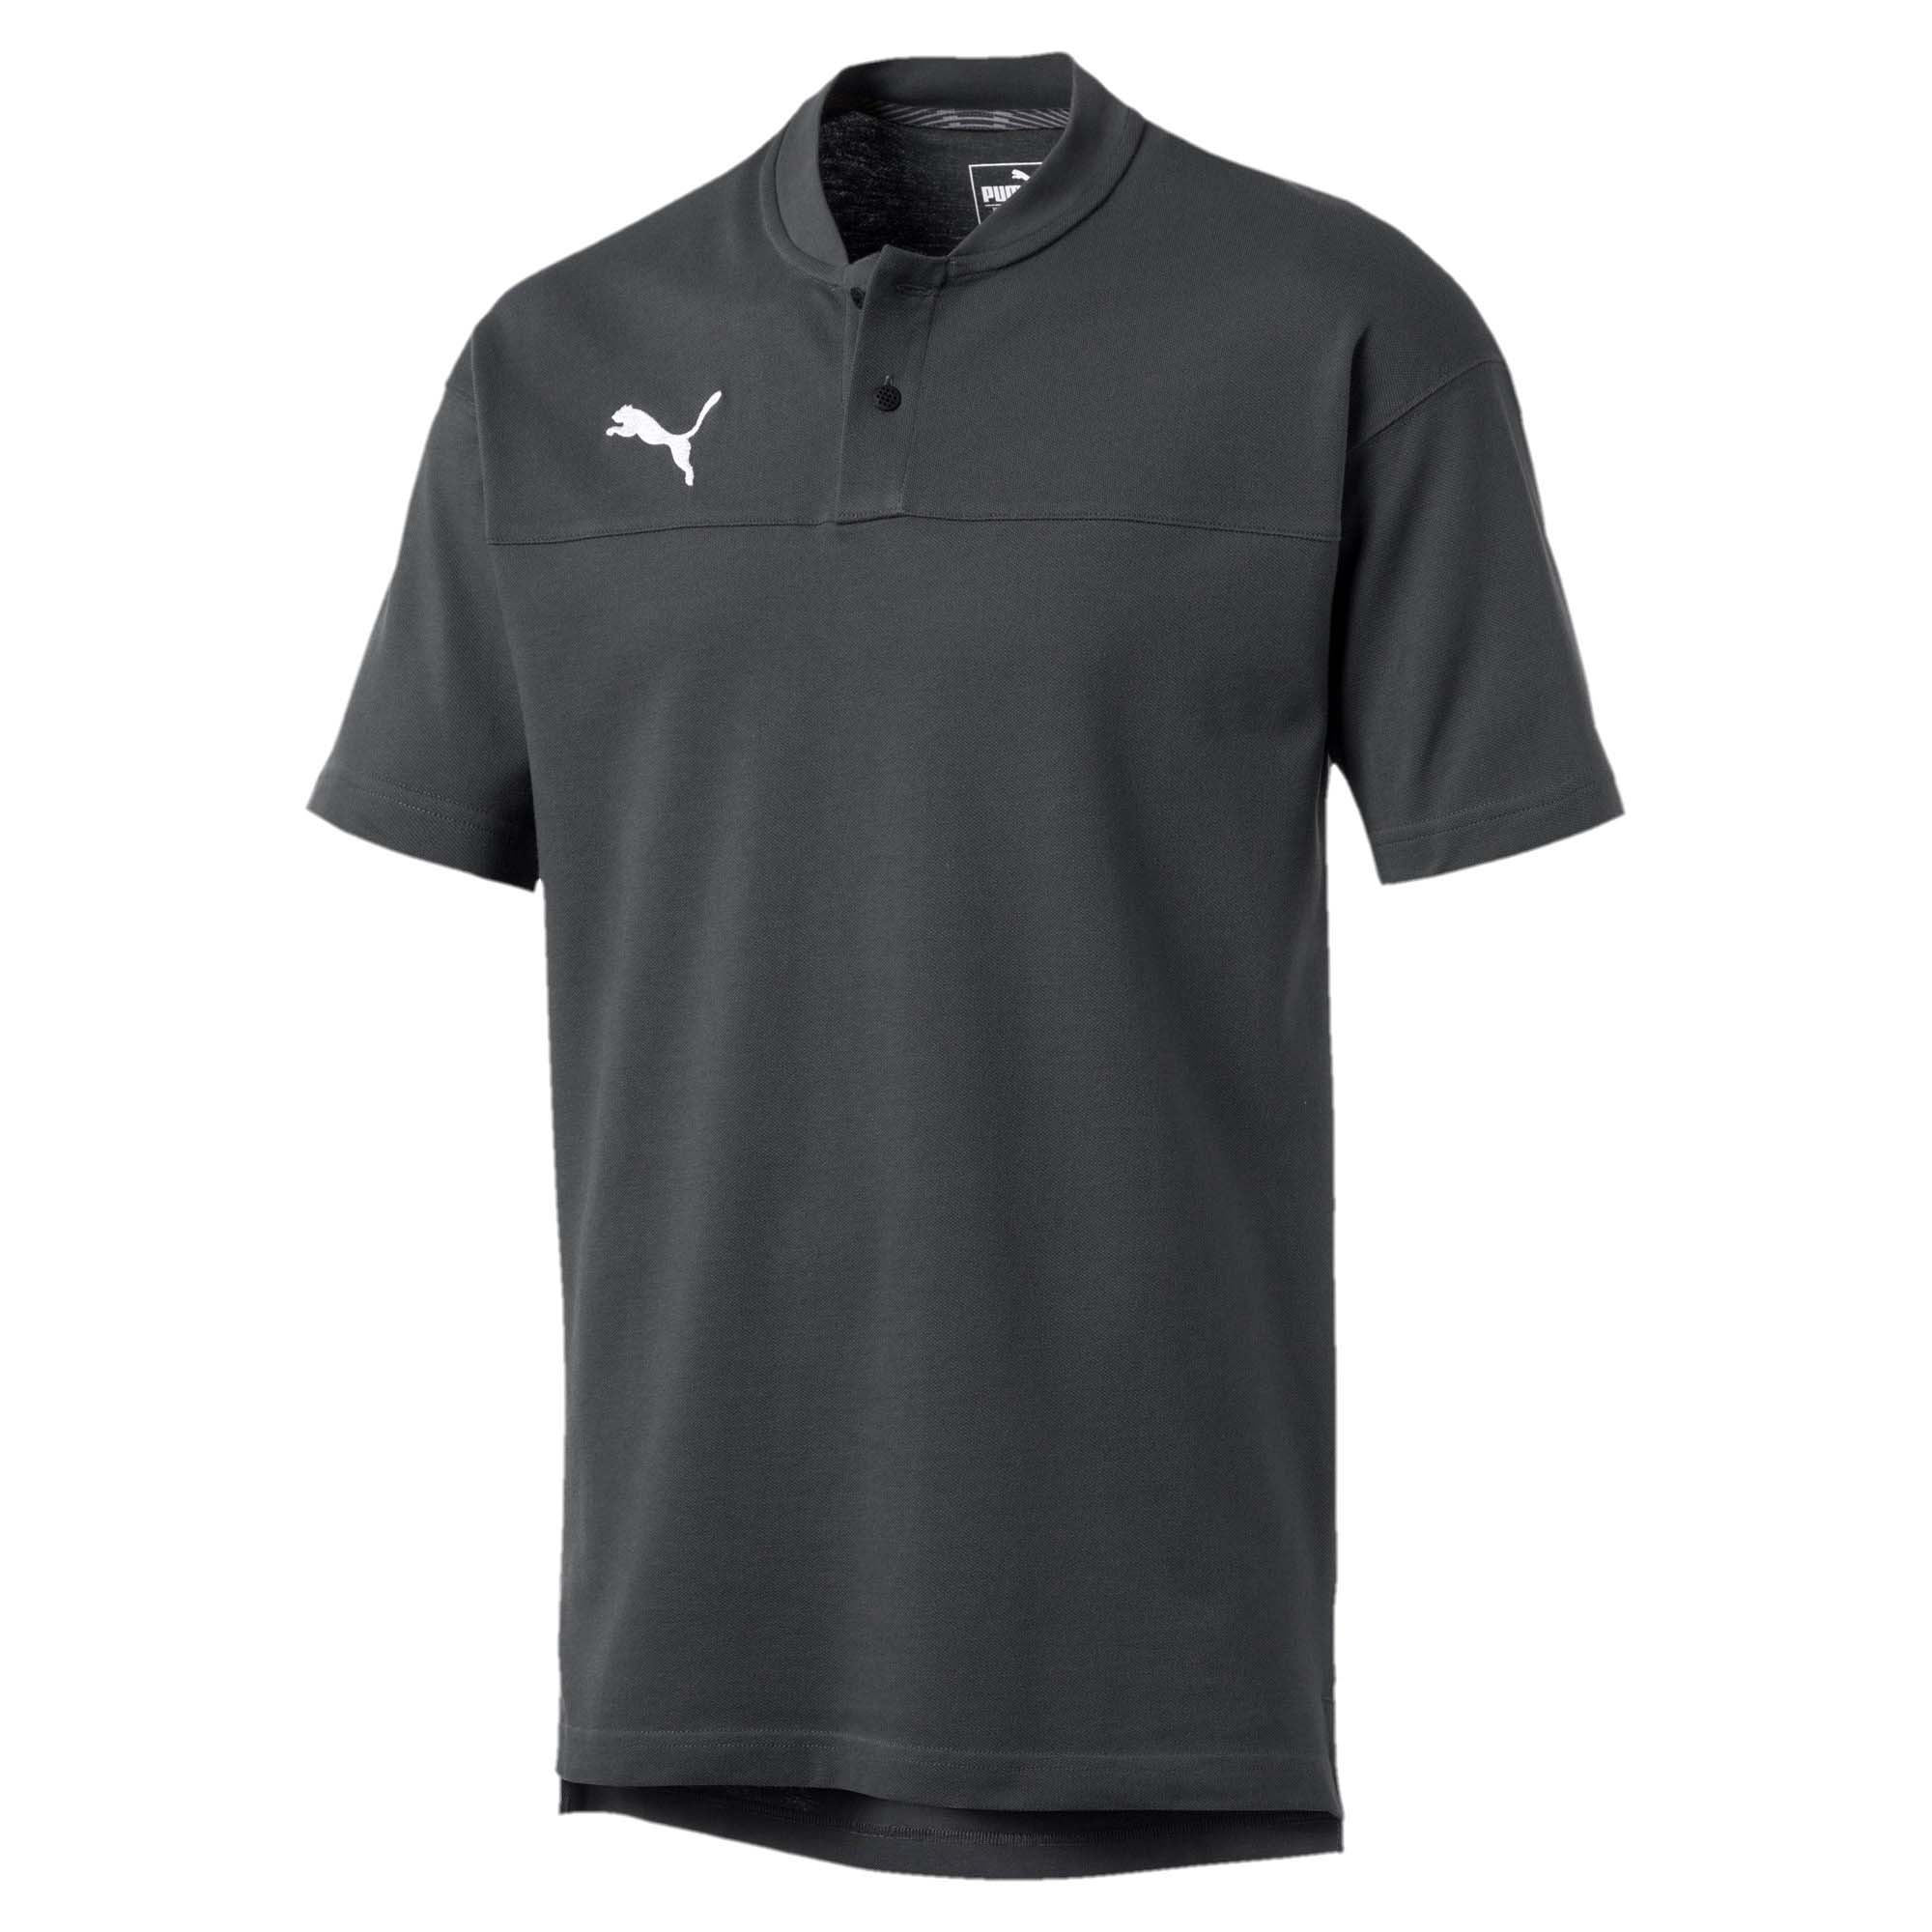 Puma Herren Poloshirt Cup Casual Polo 656036-37 XXL